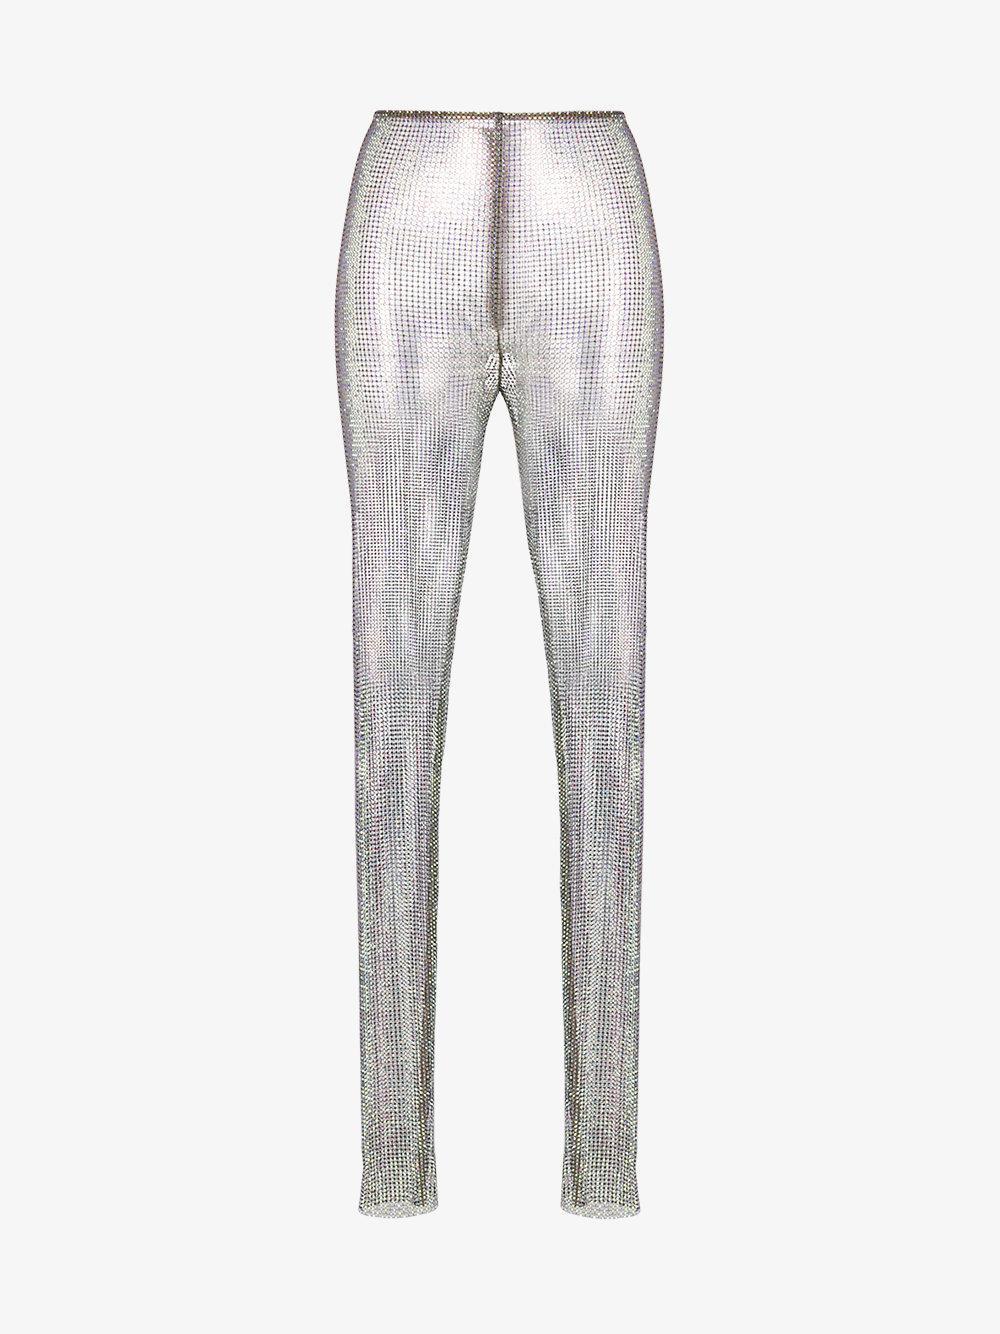 1cf50414ae6 Lyst - Gucci Crystal Net Leggings in Metallic